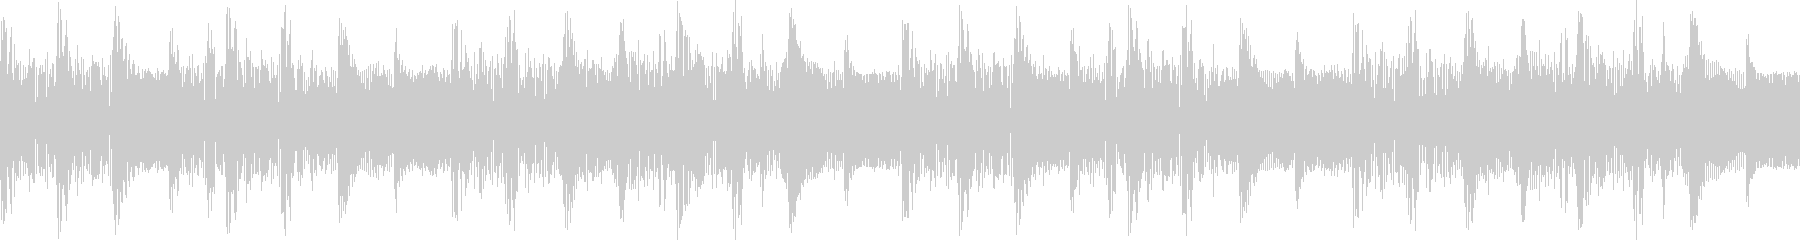 LOOP①_90bpm_Key:Cの未再生の波形